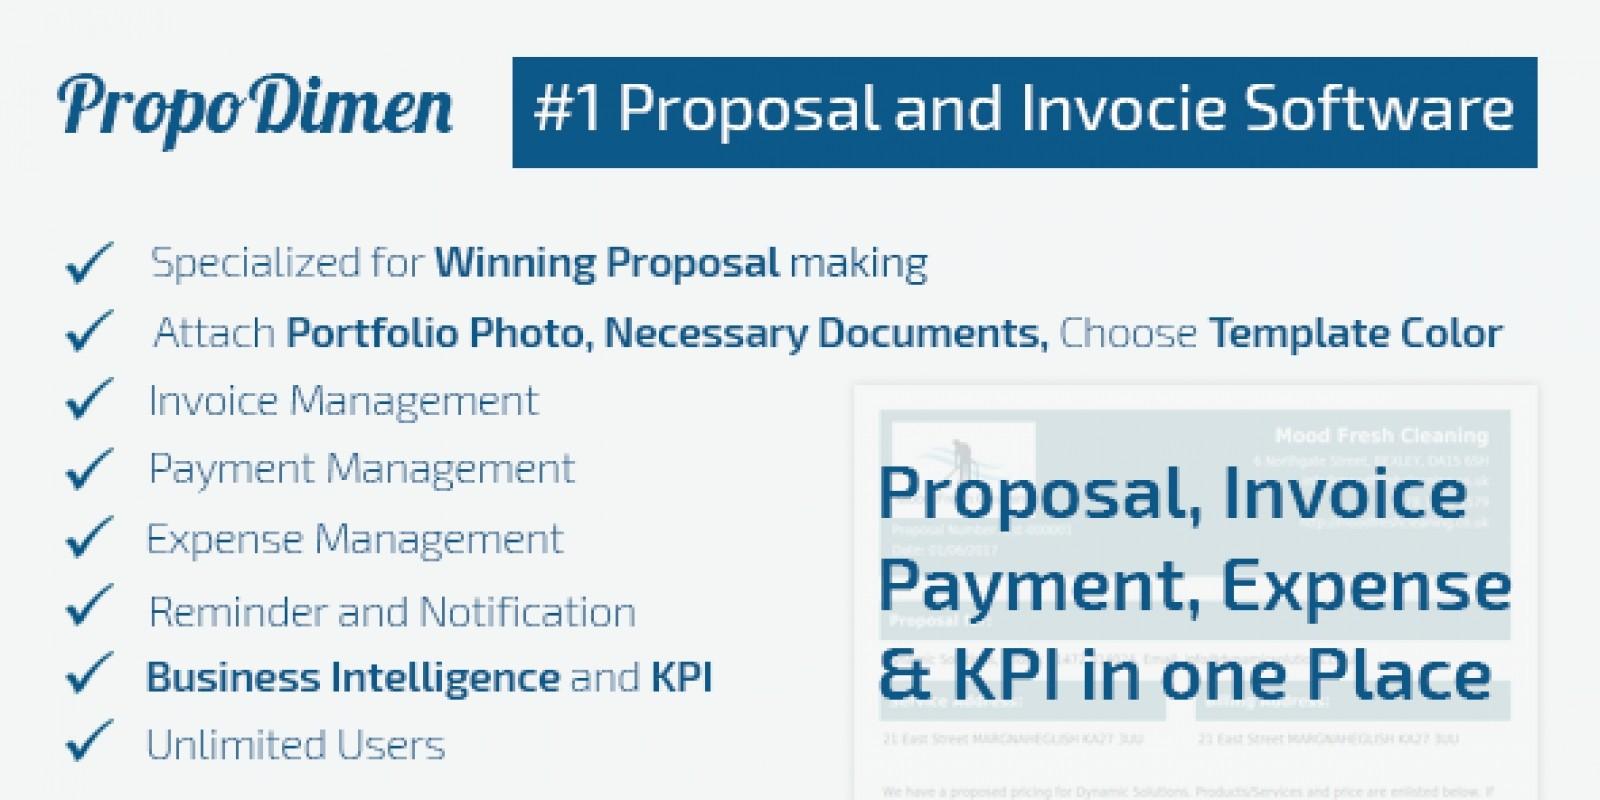 PropoDimen Proposal Invoicing PHP Script Finance PHP Scripts - Php invoice script